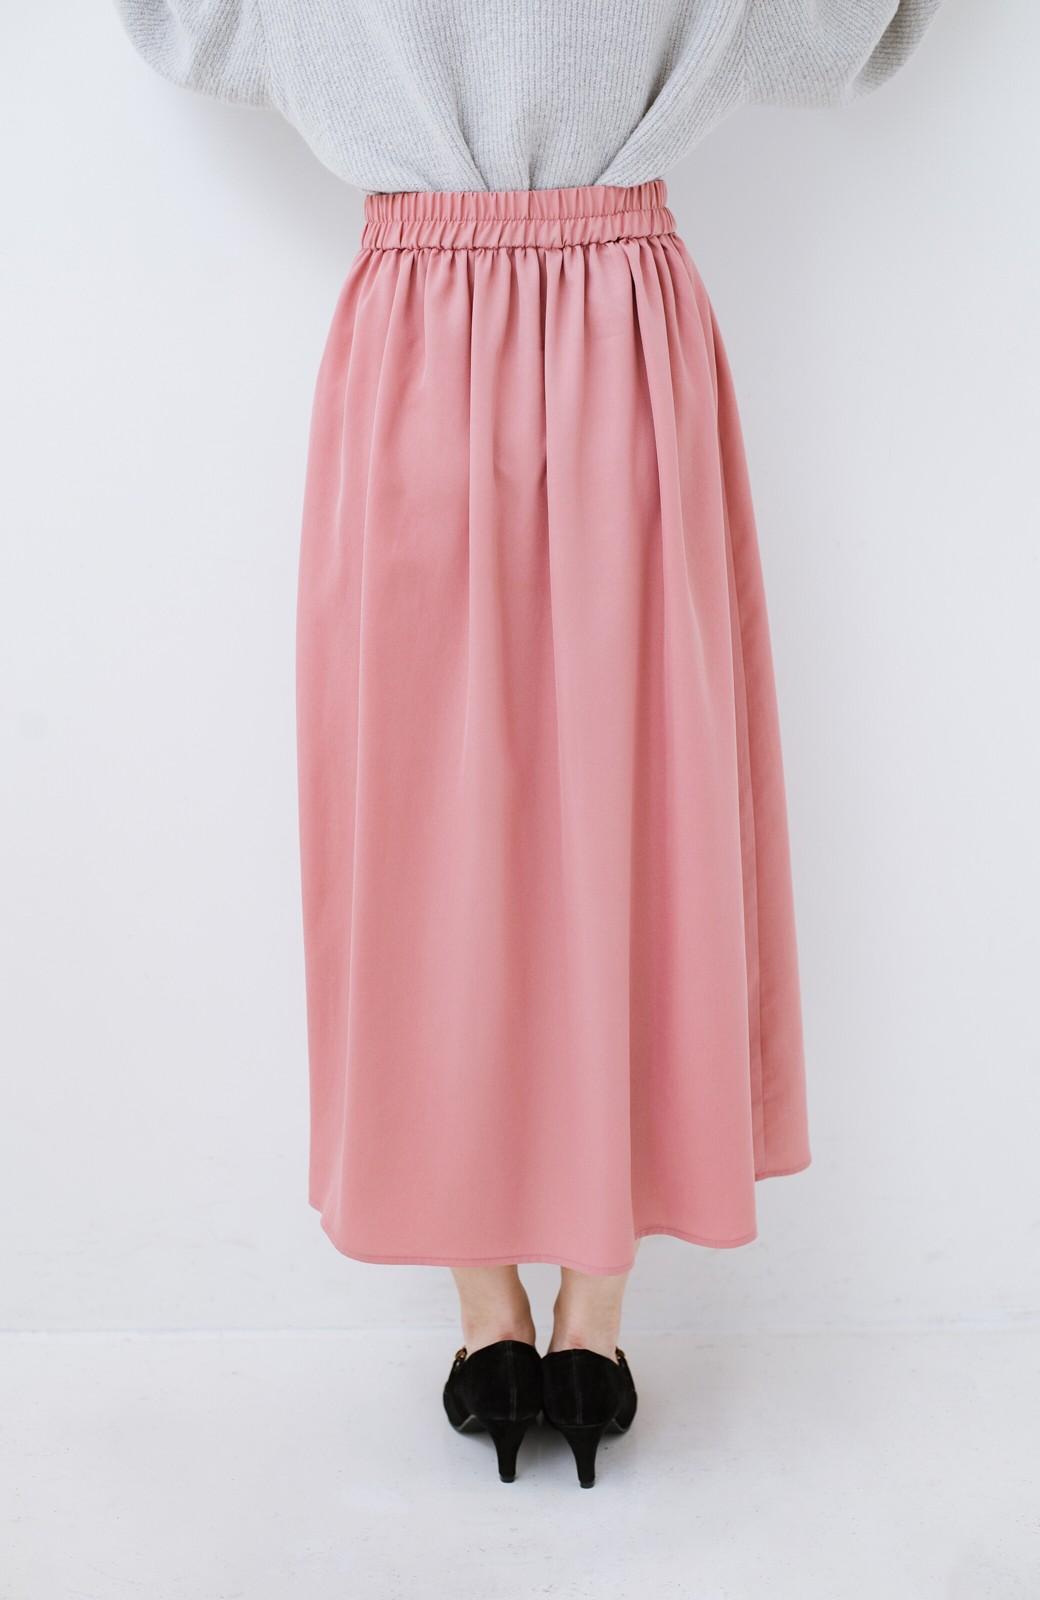 haco! きれいなお姉さんになれる気がするミモレ丈フレアースカート <ピンク>の商品写真6